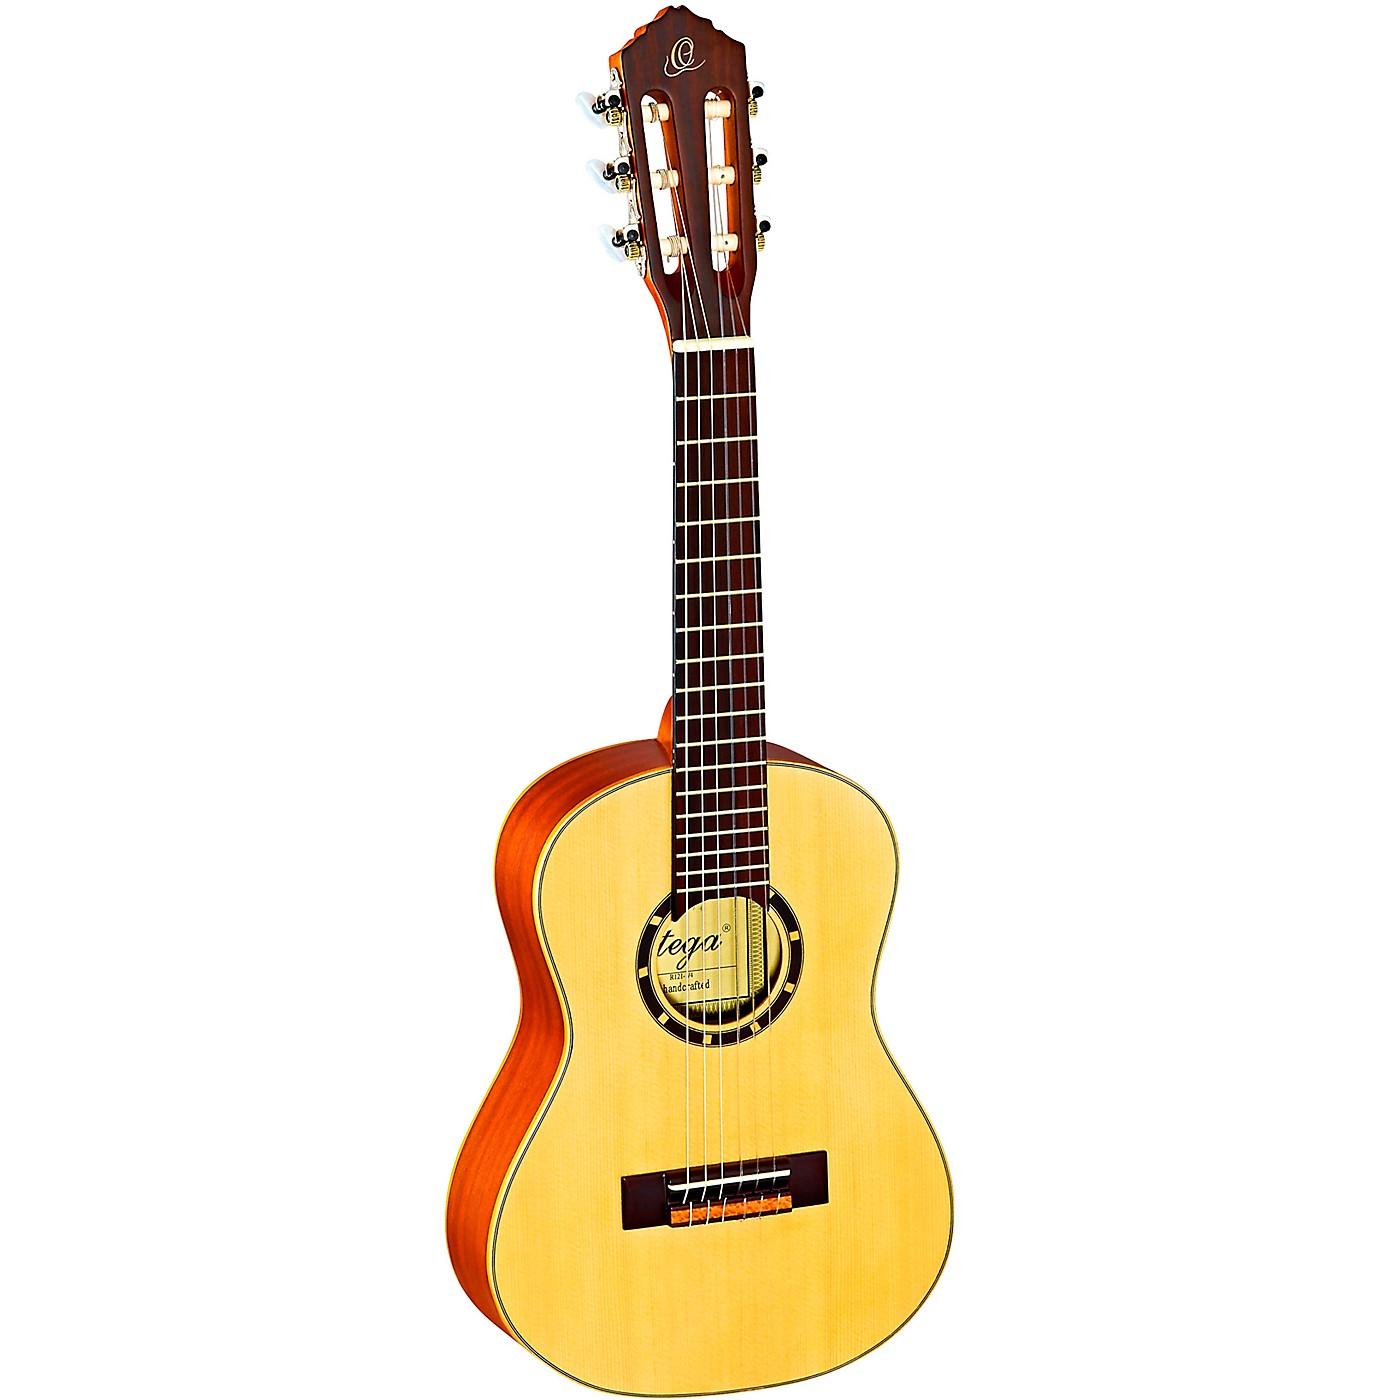 Ortega Family Series R121-1/4 1/4 Size Classical Guitar thumbnail